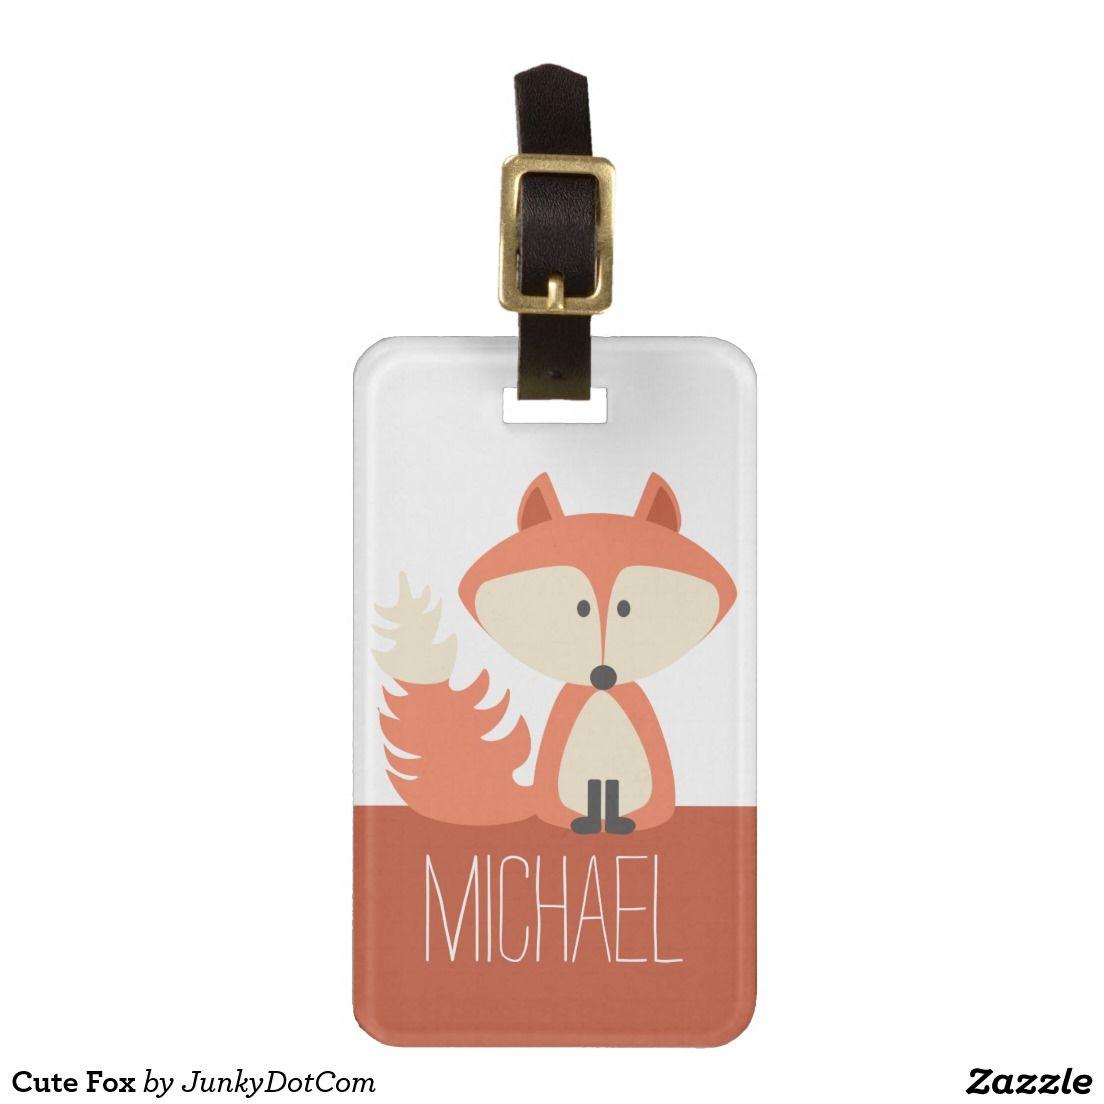 Cute Fox Bag Tag Nov 17 2016 @zazzle #junkydotcom